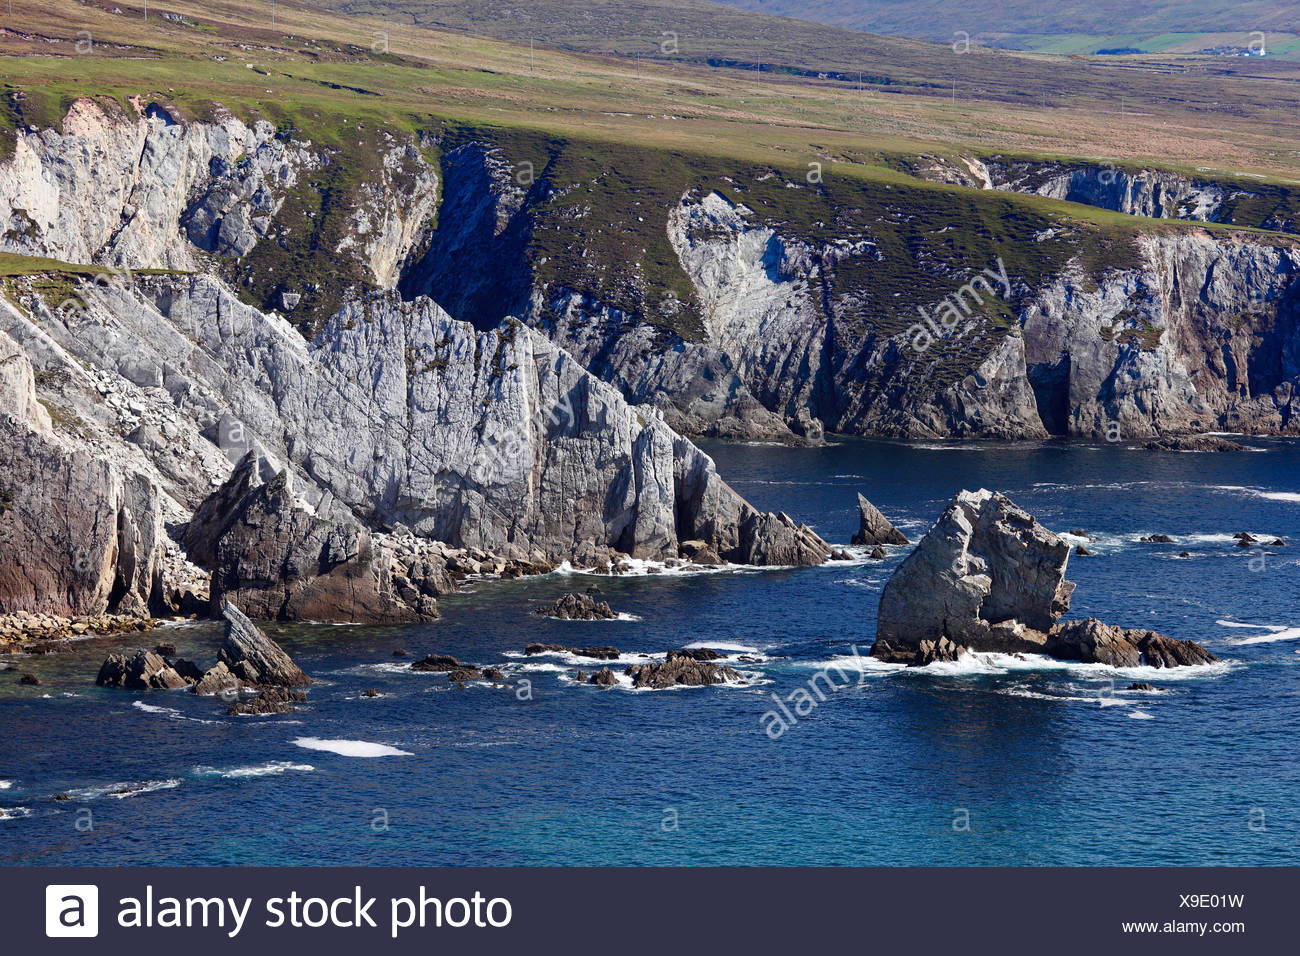 Cliffs near Dooega, Achill Island, County Mayo, Connacht province, Republic of Ireland, Europe - Stock Image